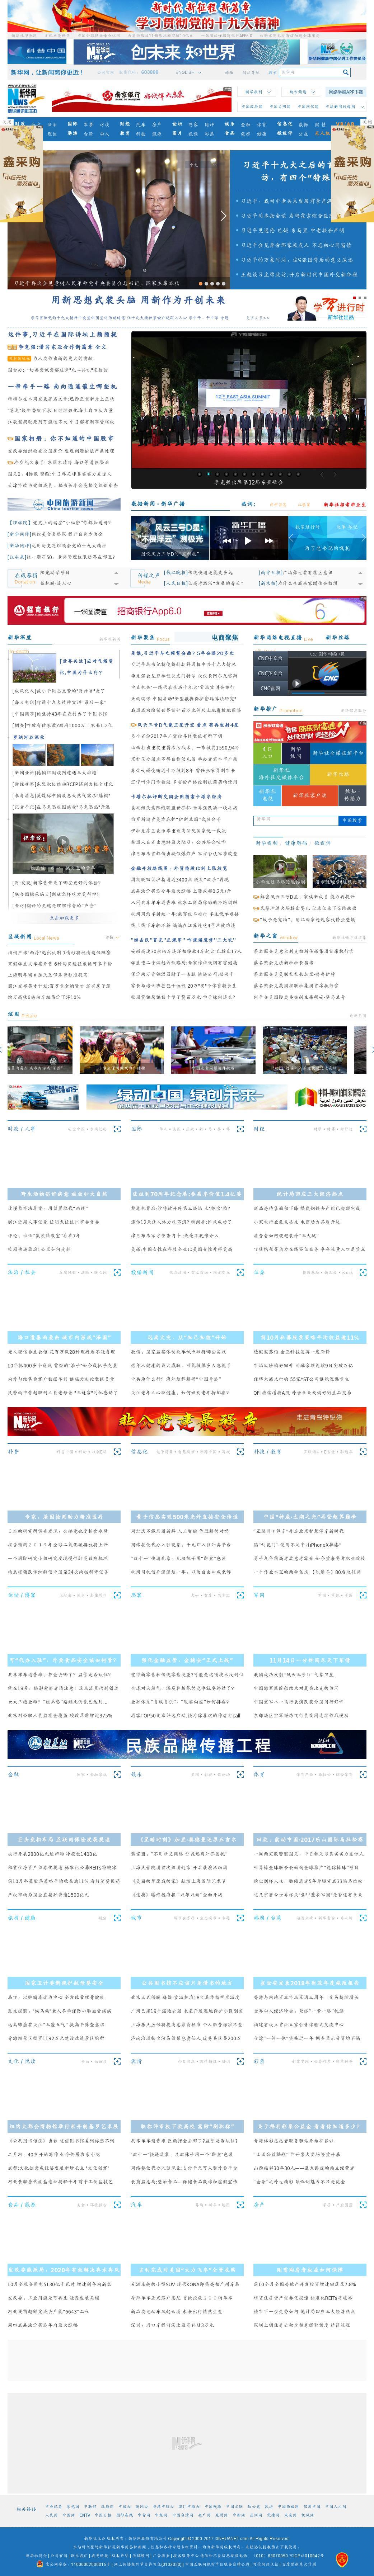 Xinhua at Wednesday Nov. 15, 2017, 8:17 a.m. UTC